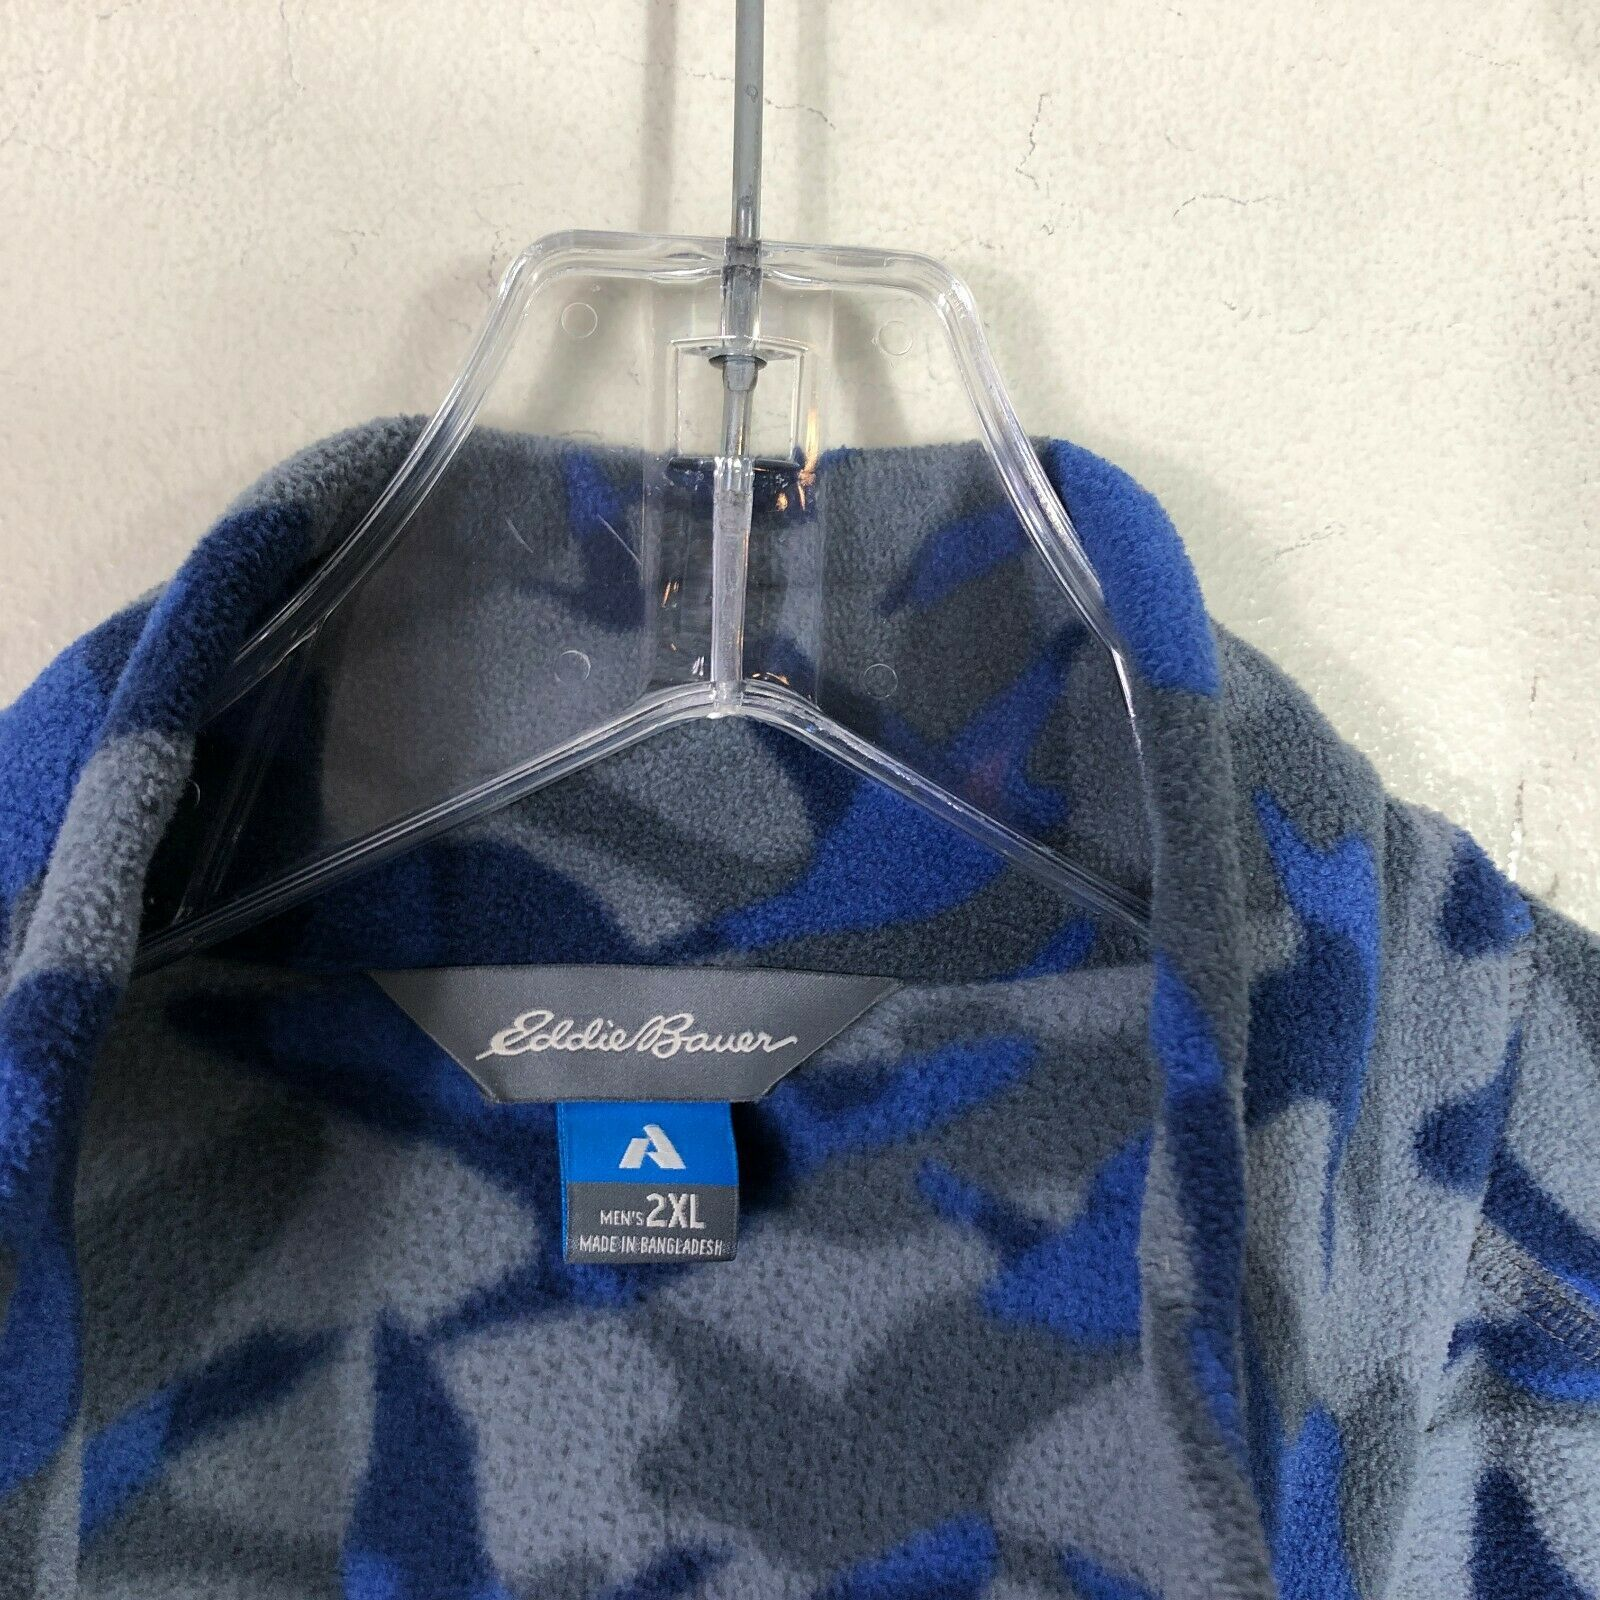 Eddie Bauer First Ascent Fleece Jacket 1/2 Zip Men's 2XL Blue Gray Long Sleeve image 4